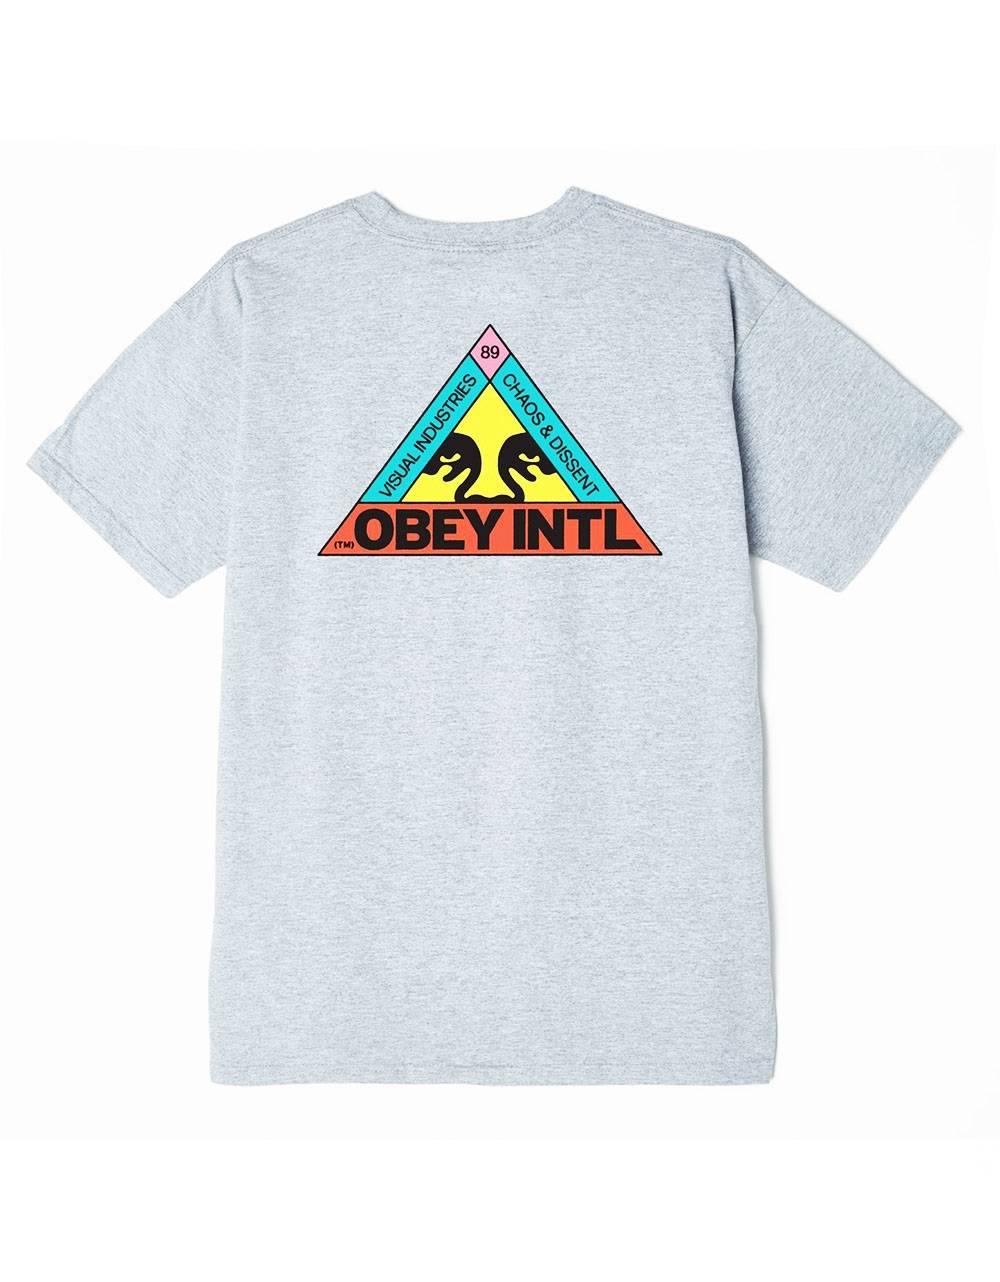 Obey trinity classic t-shirt - heather grey obey T-shirt 45,00€